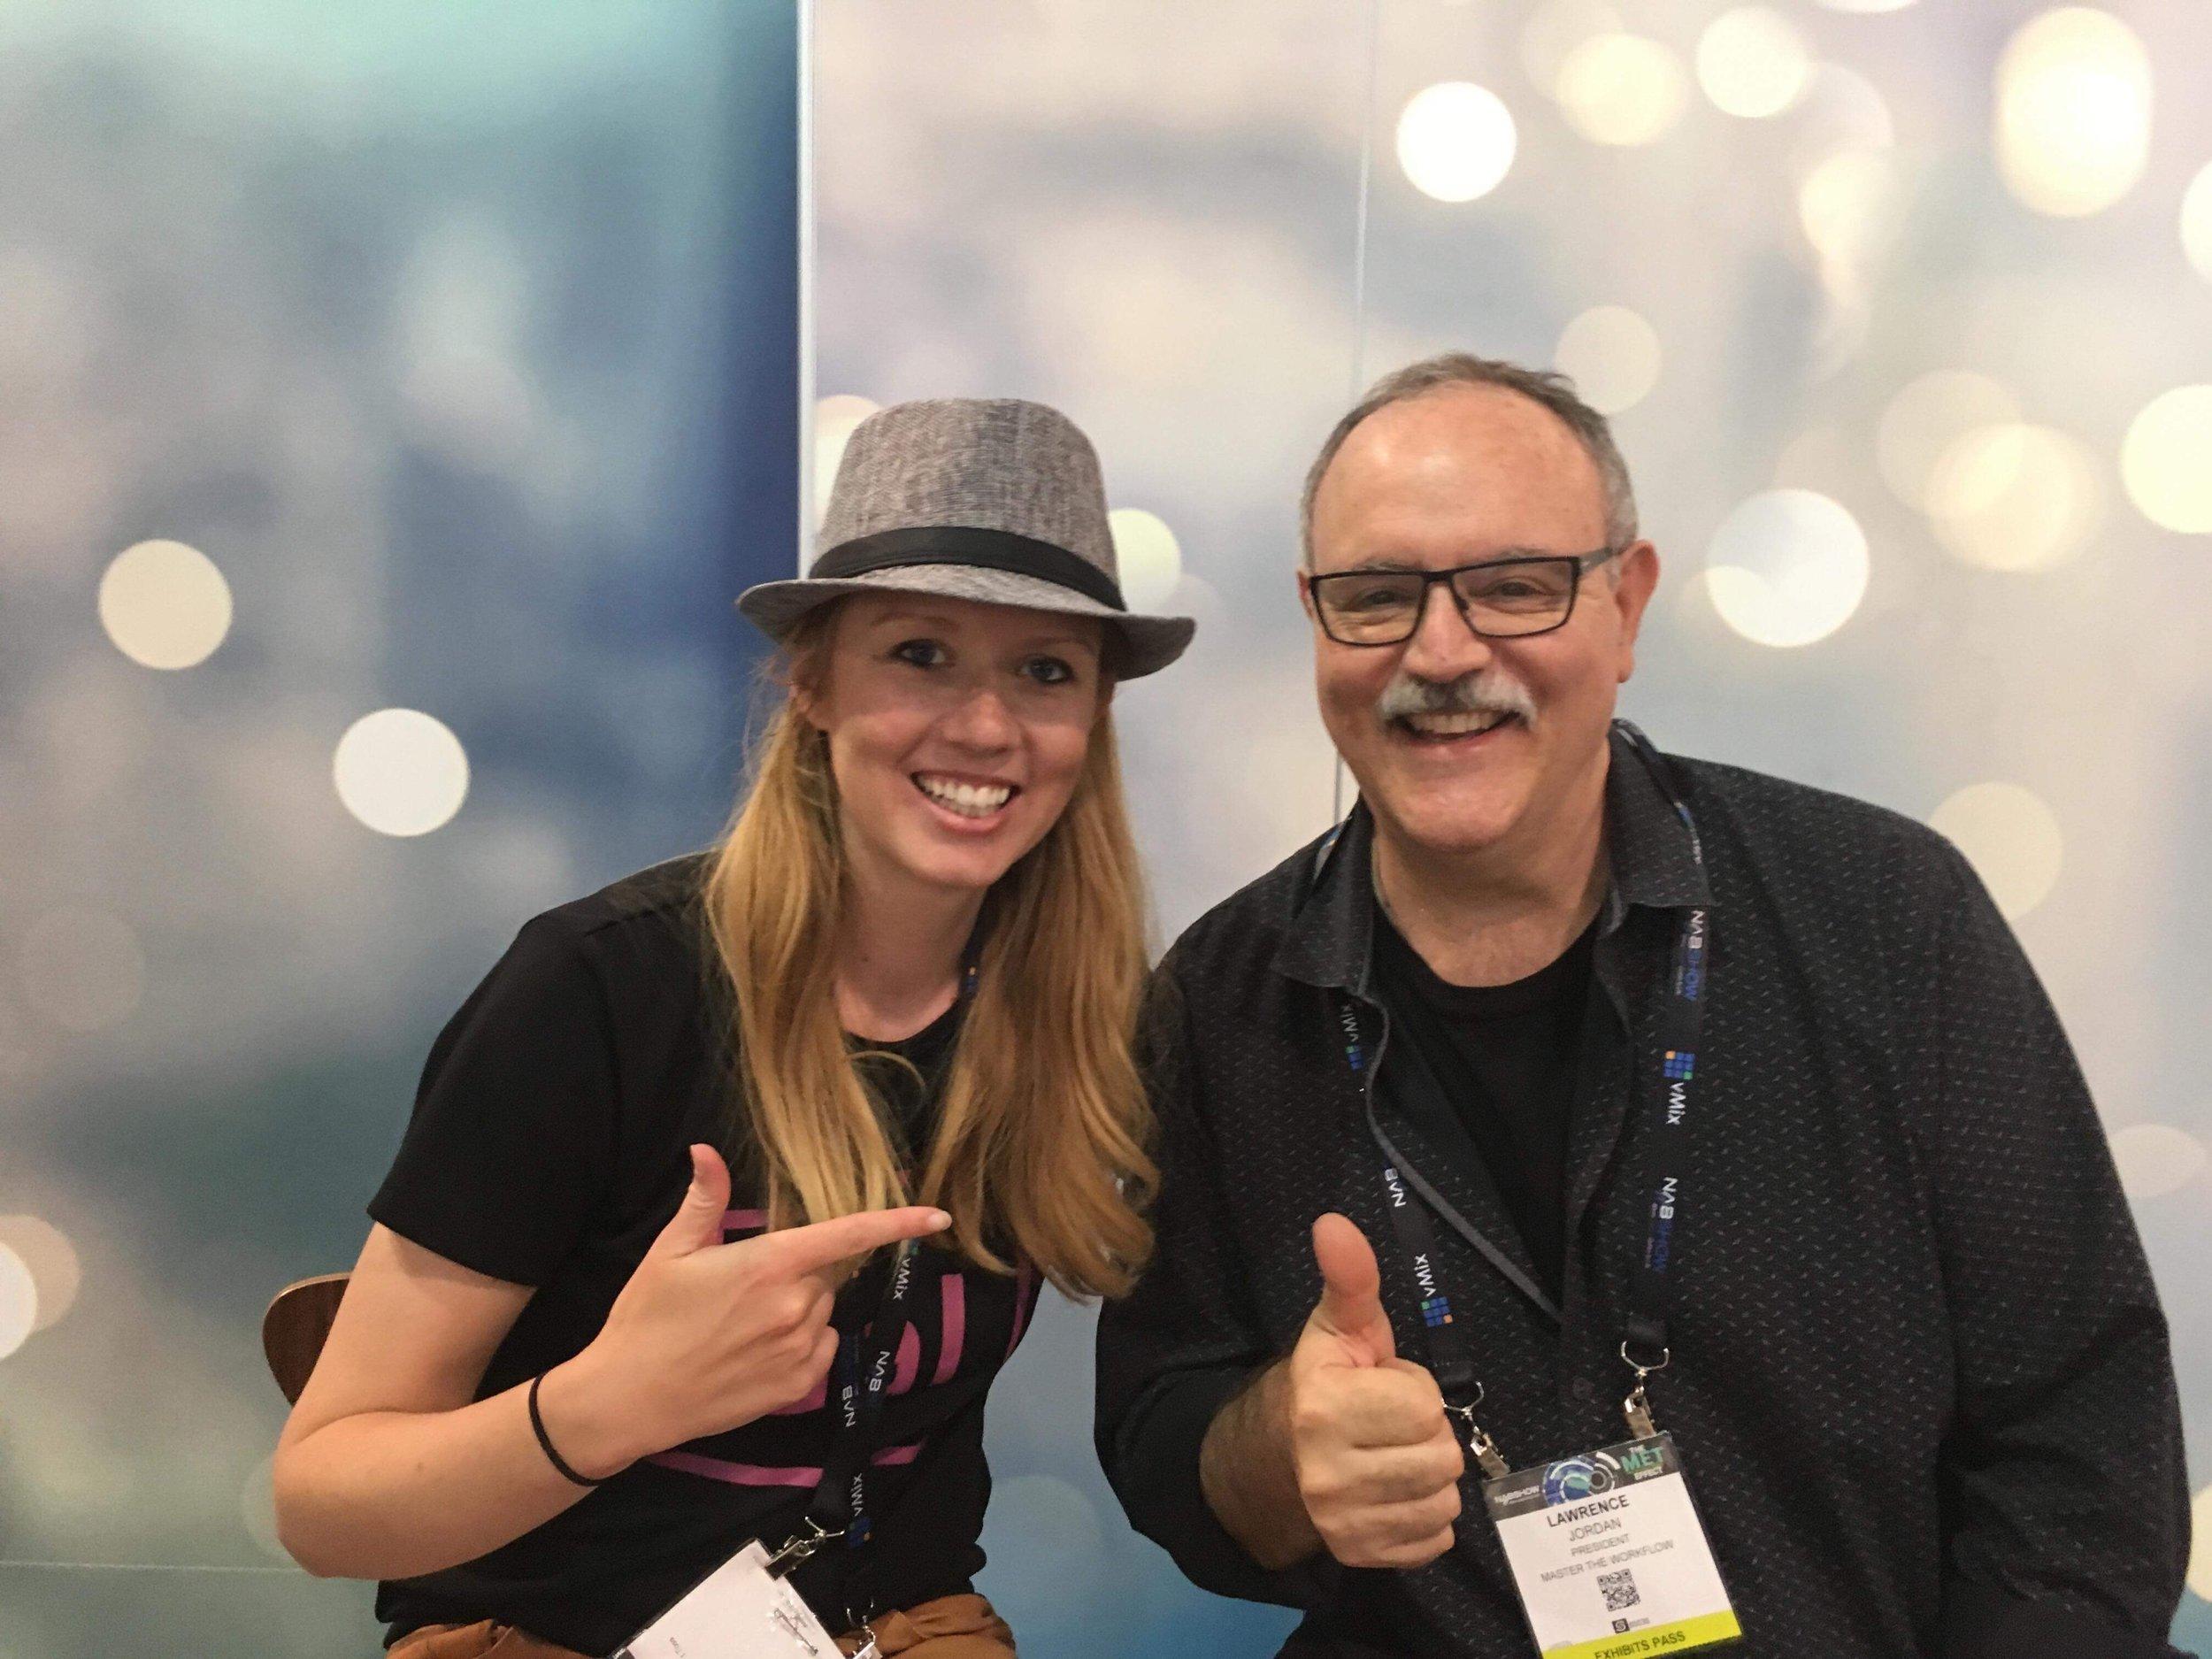 Kelsey (Premiere Gal) and Lawrence Jordan at NAB SHOW 2018